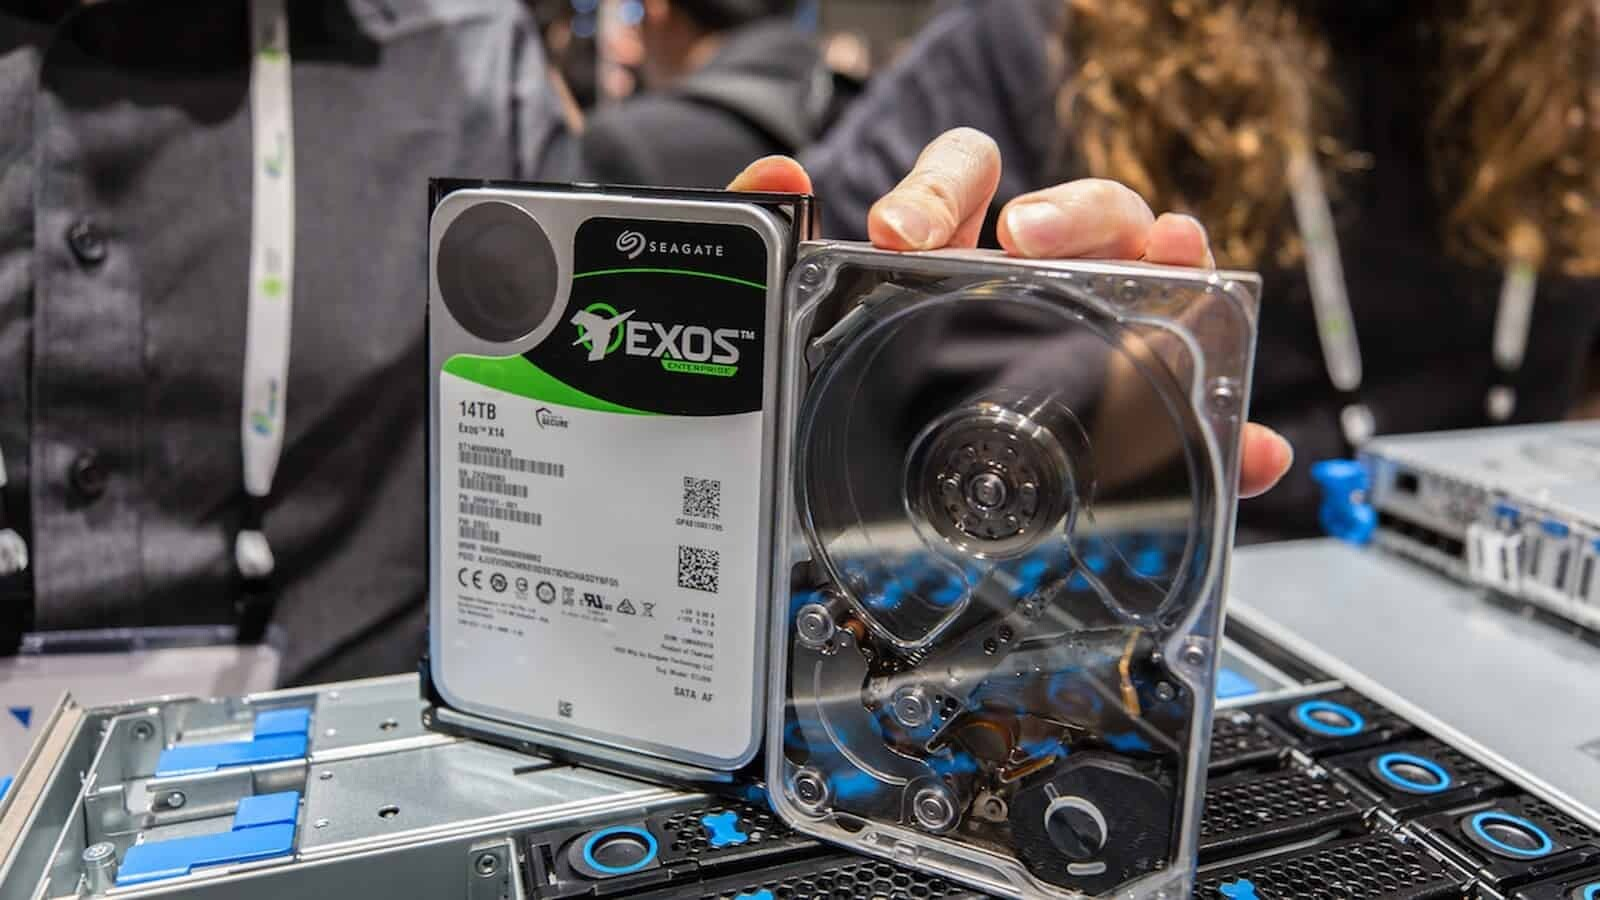 Seagate Reveals 524 MB/s Mach.2 Exos 2X14 HDD!